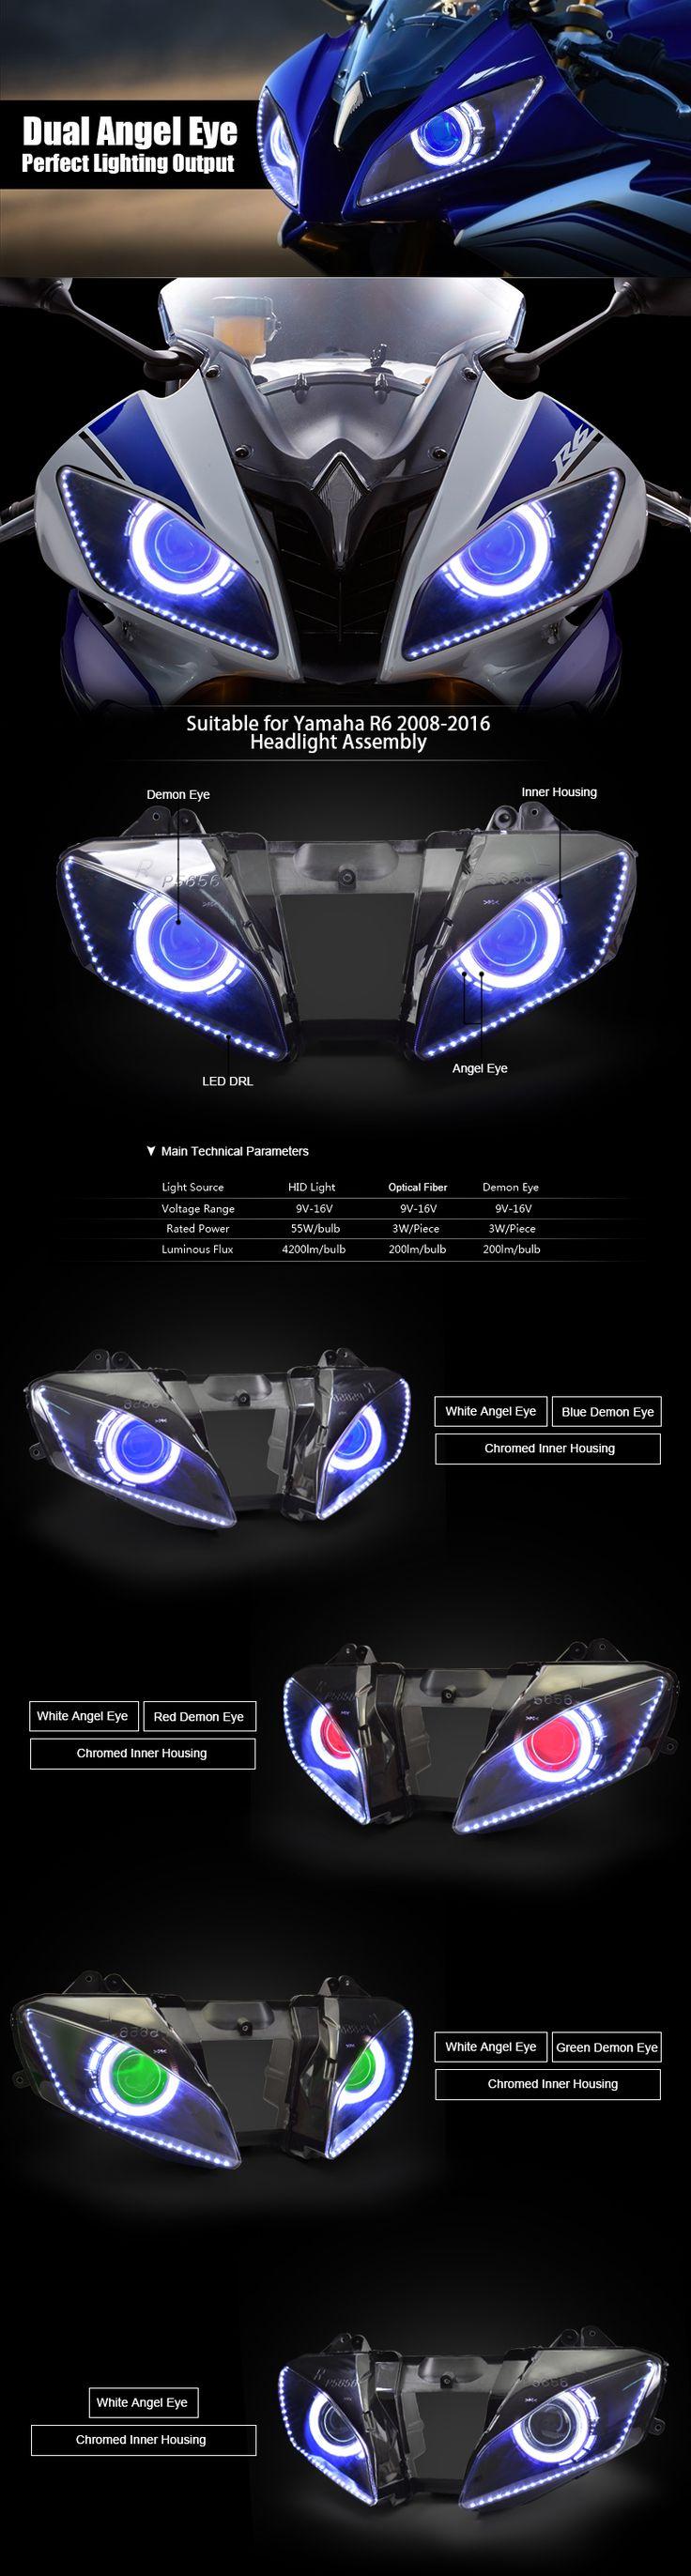 Yamaha R6 Angel Eye HID Projector Headlight Assembly 2008-2016